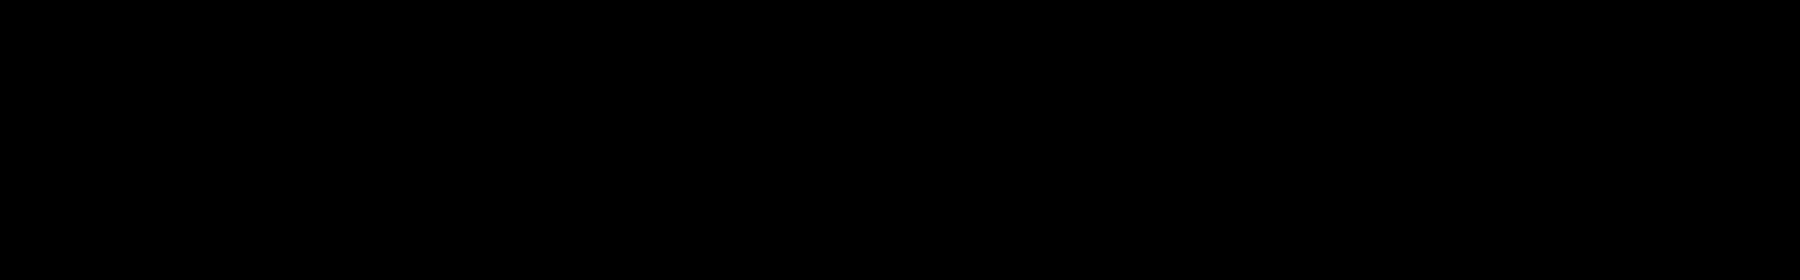 Eurotrvsh - Seppuku Drill Trap Ableton Template audio waveform